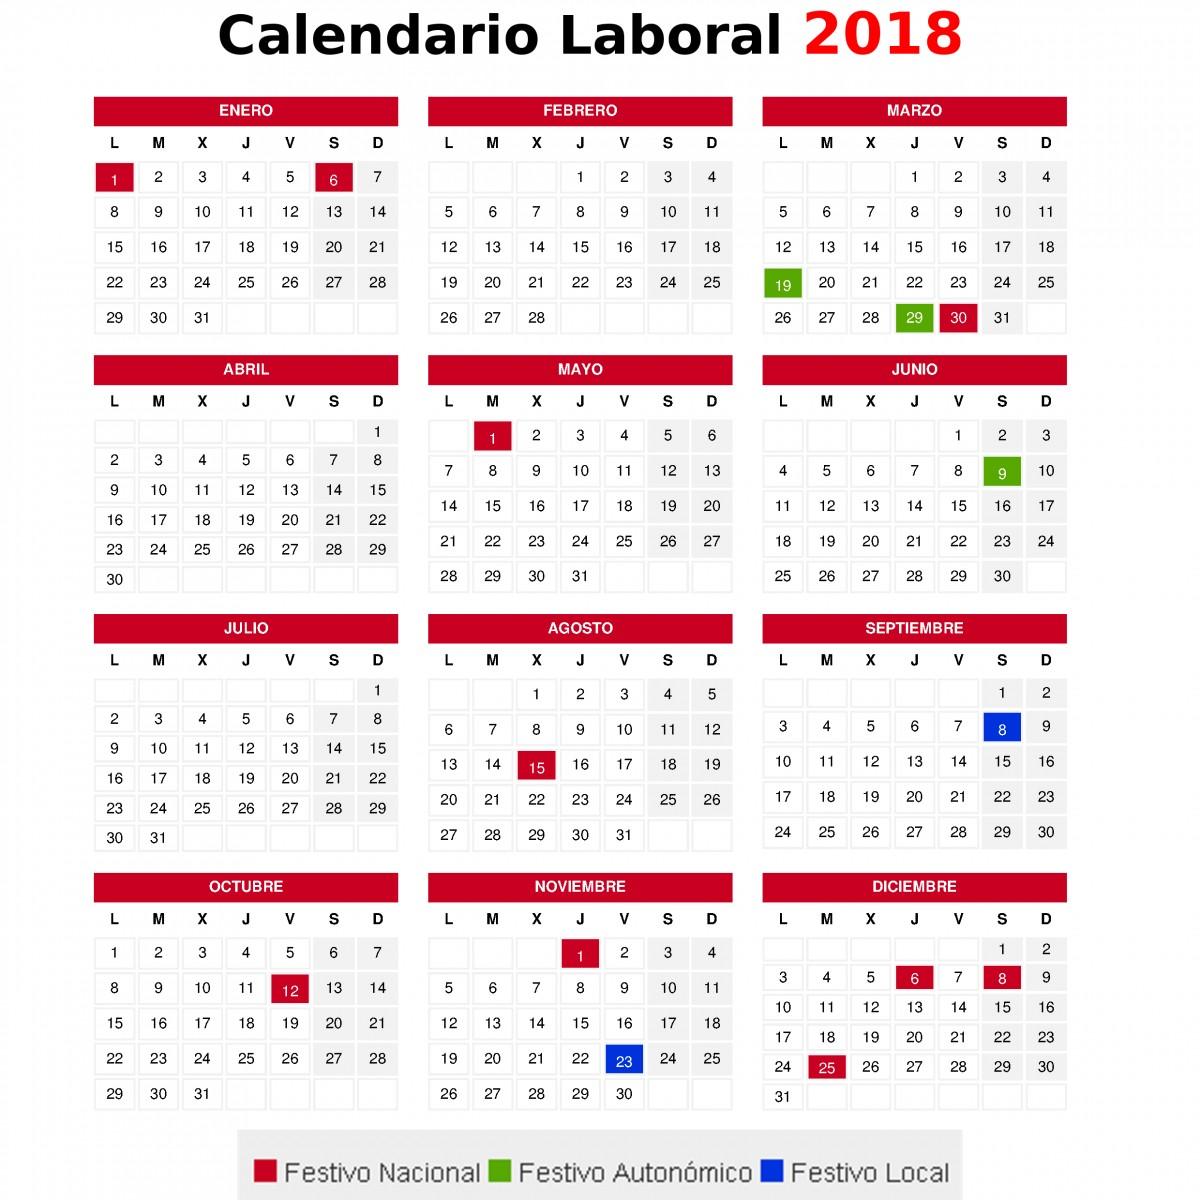 calendario laboral lorca